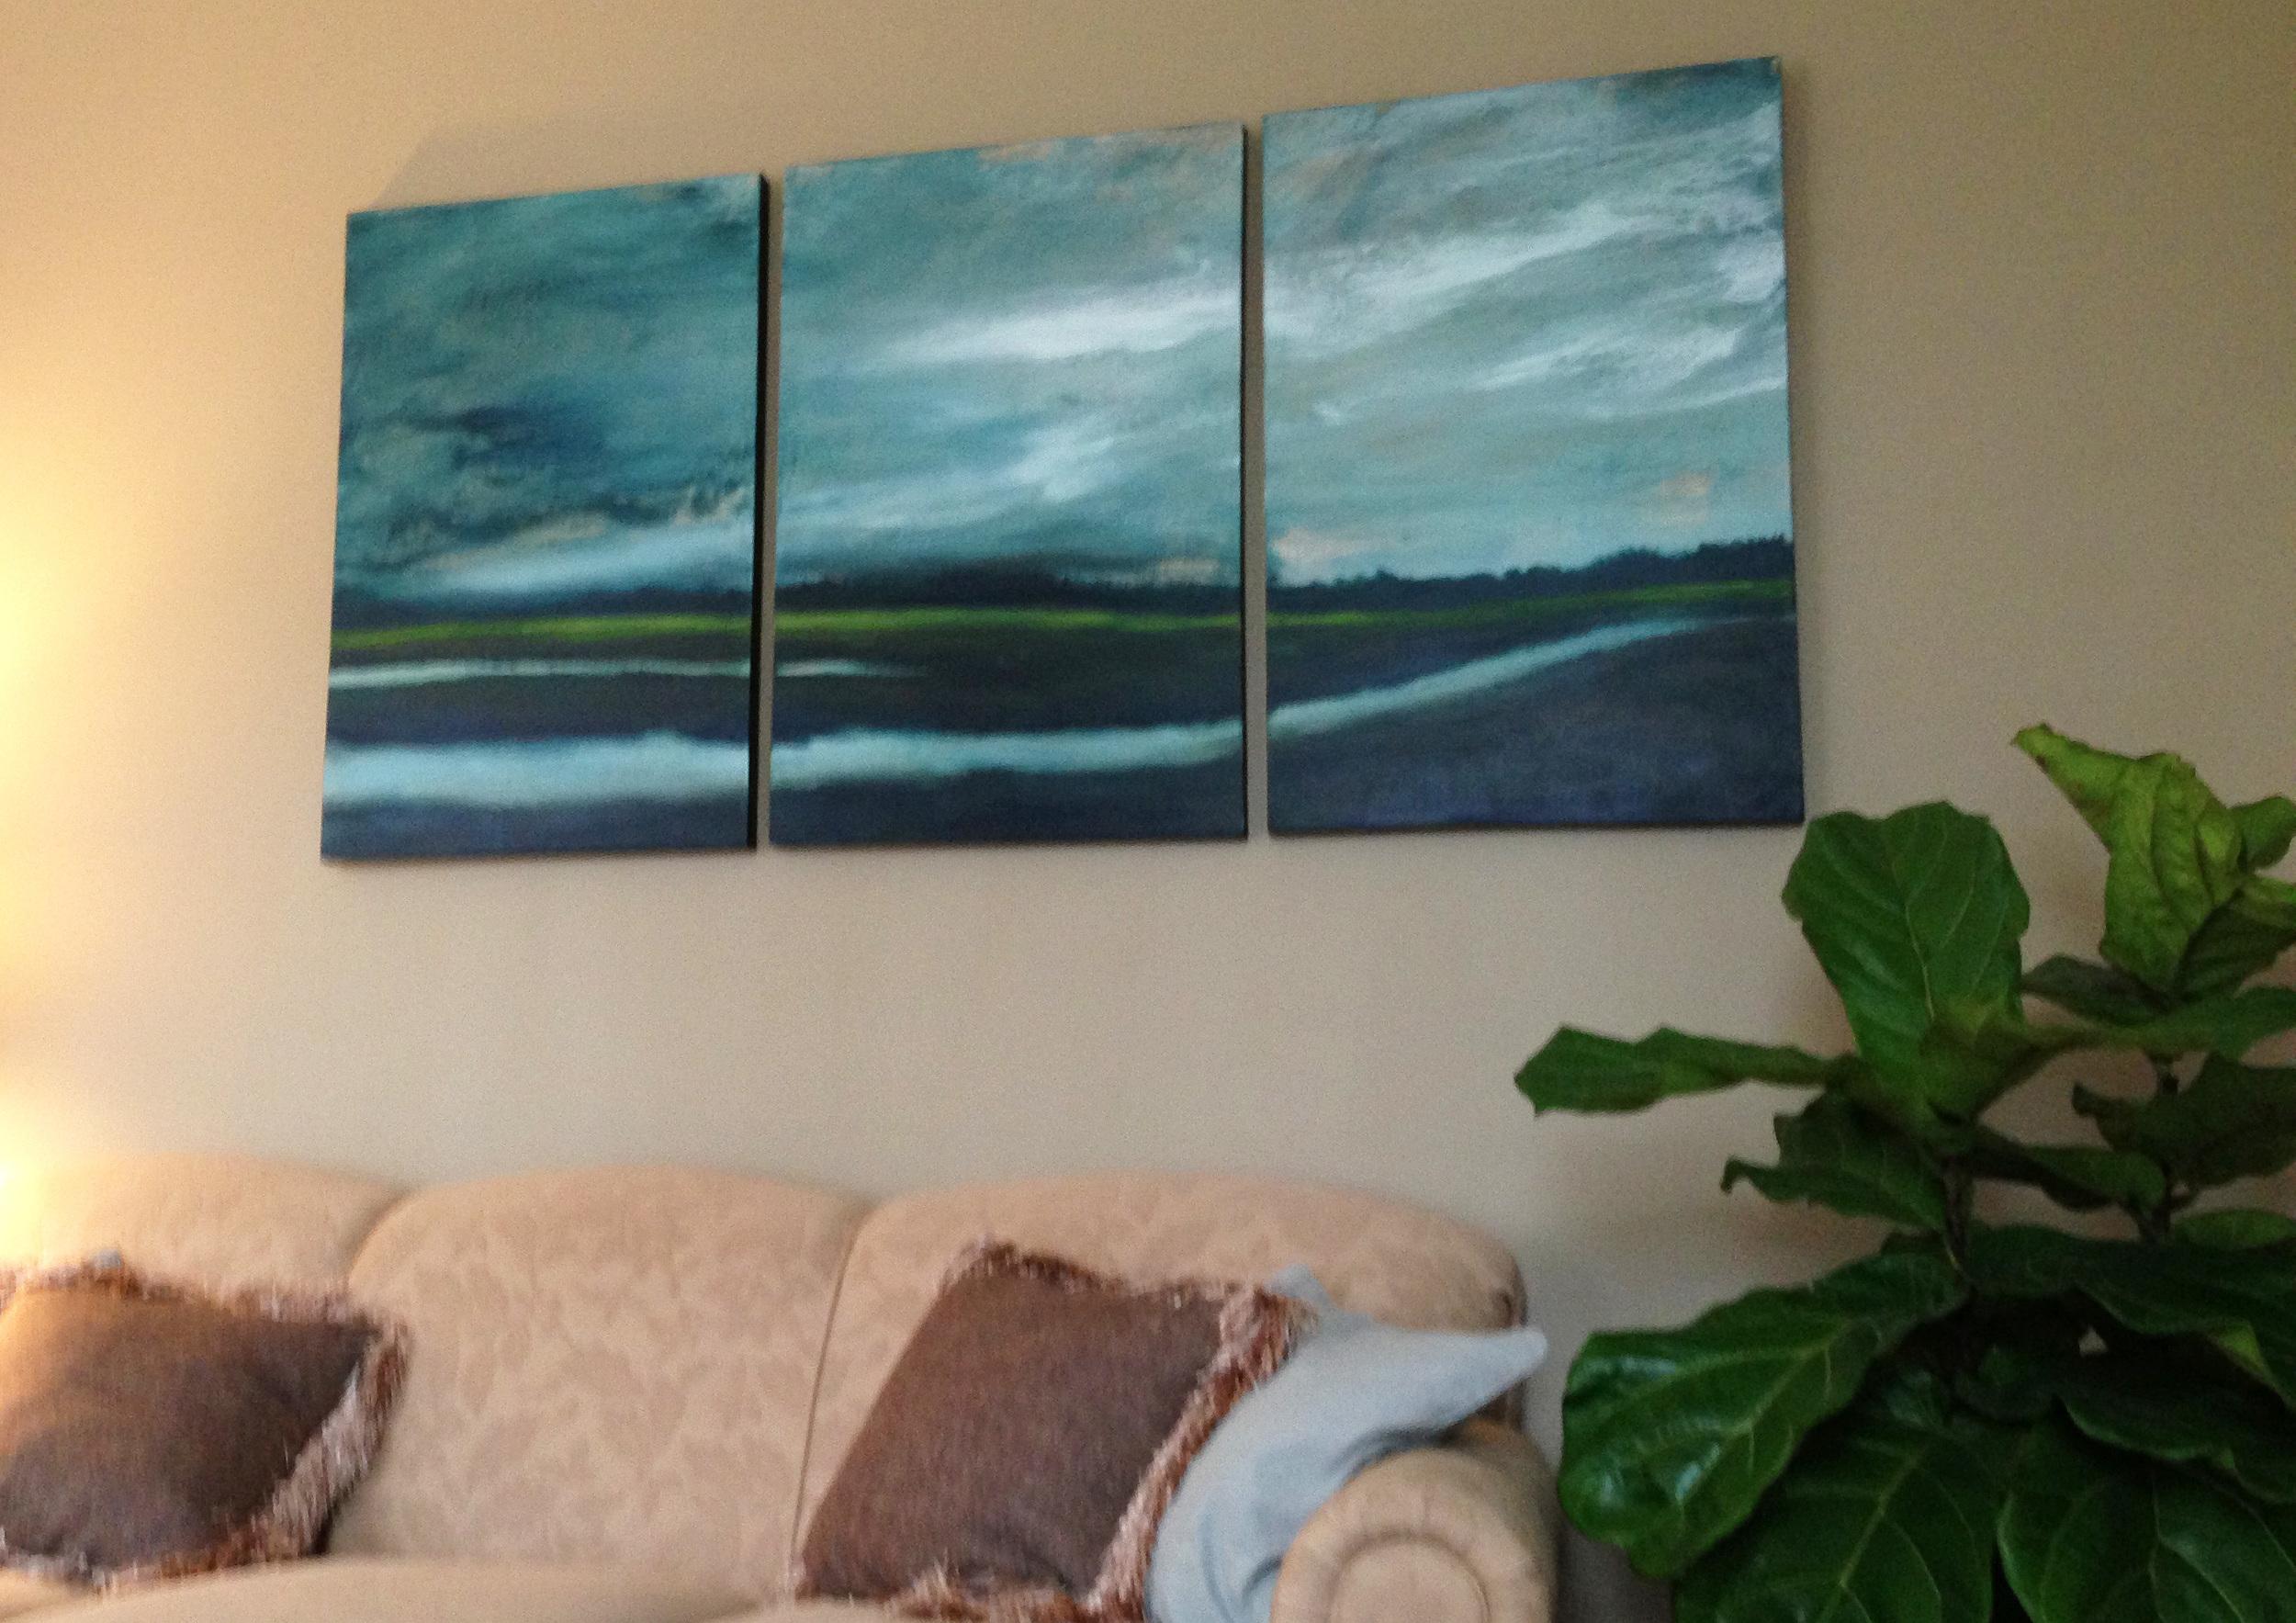 custom-art-commissions-by-greensboro-artist-tracey-marshall-57b.jpg